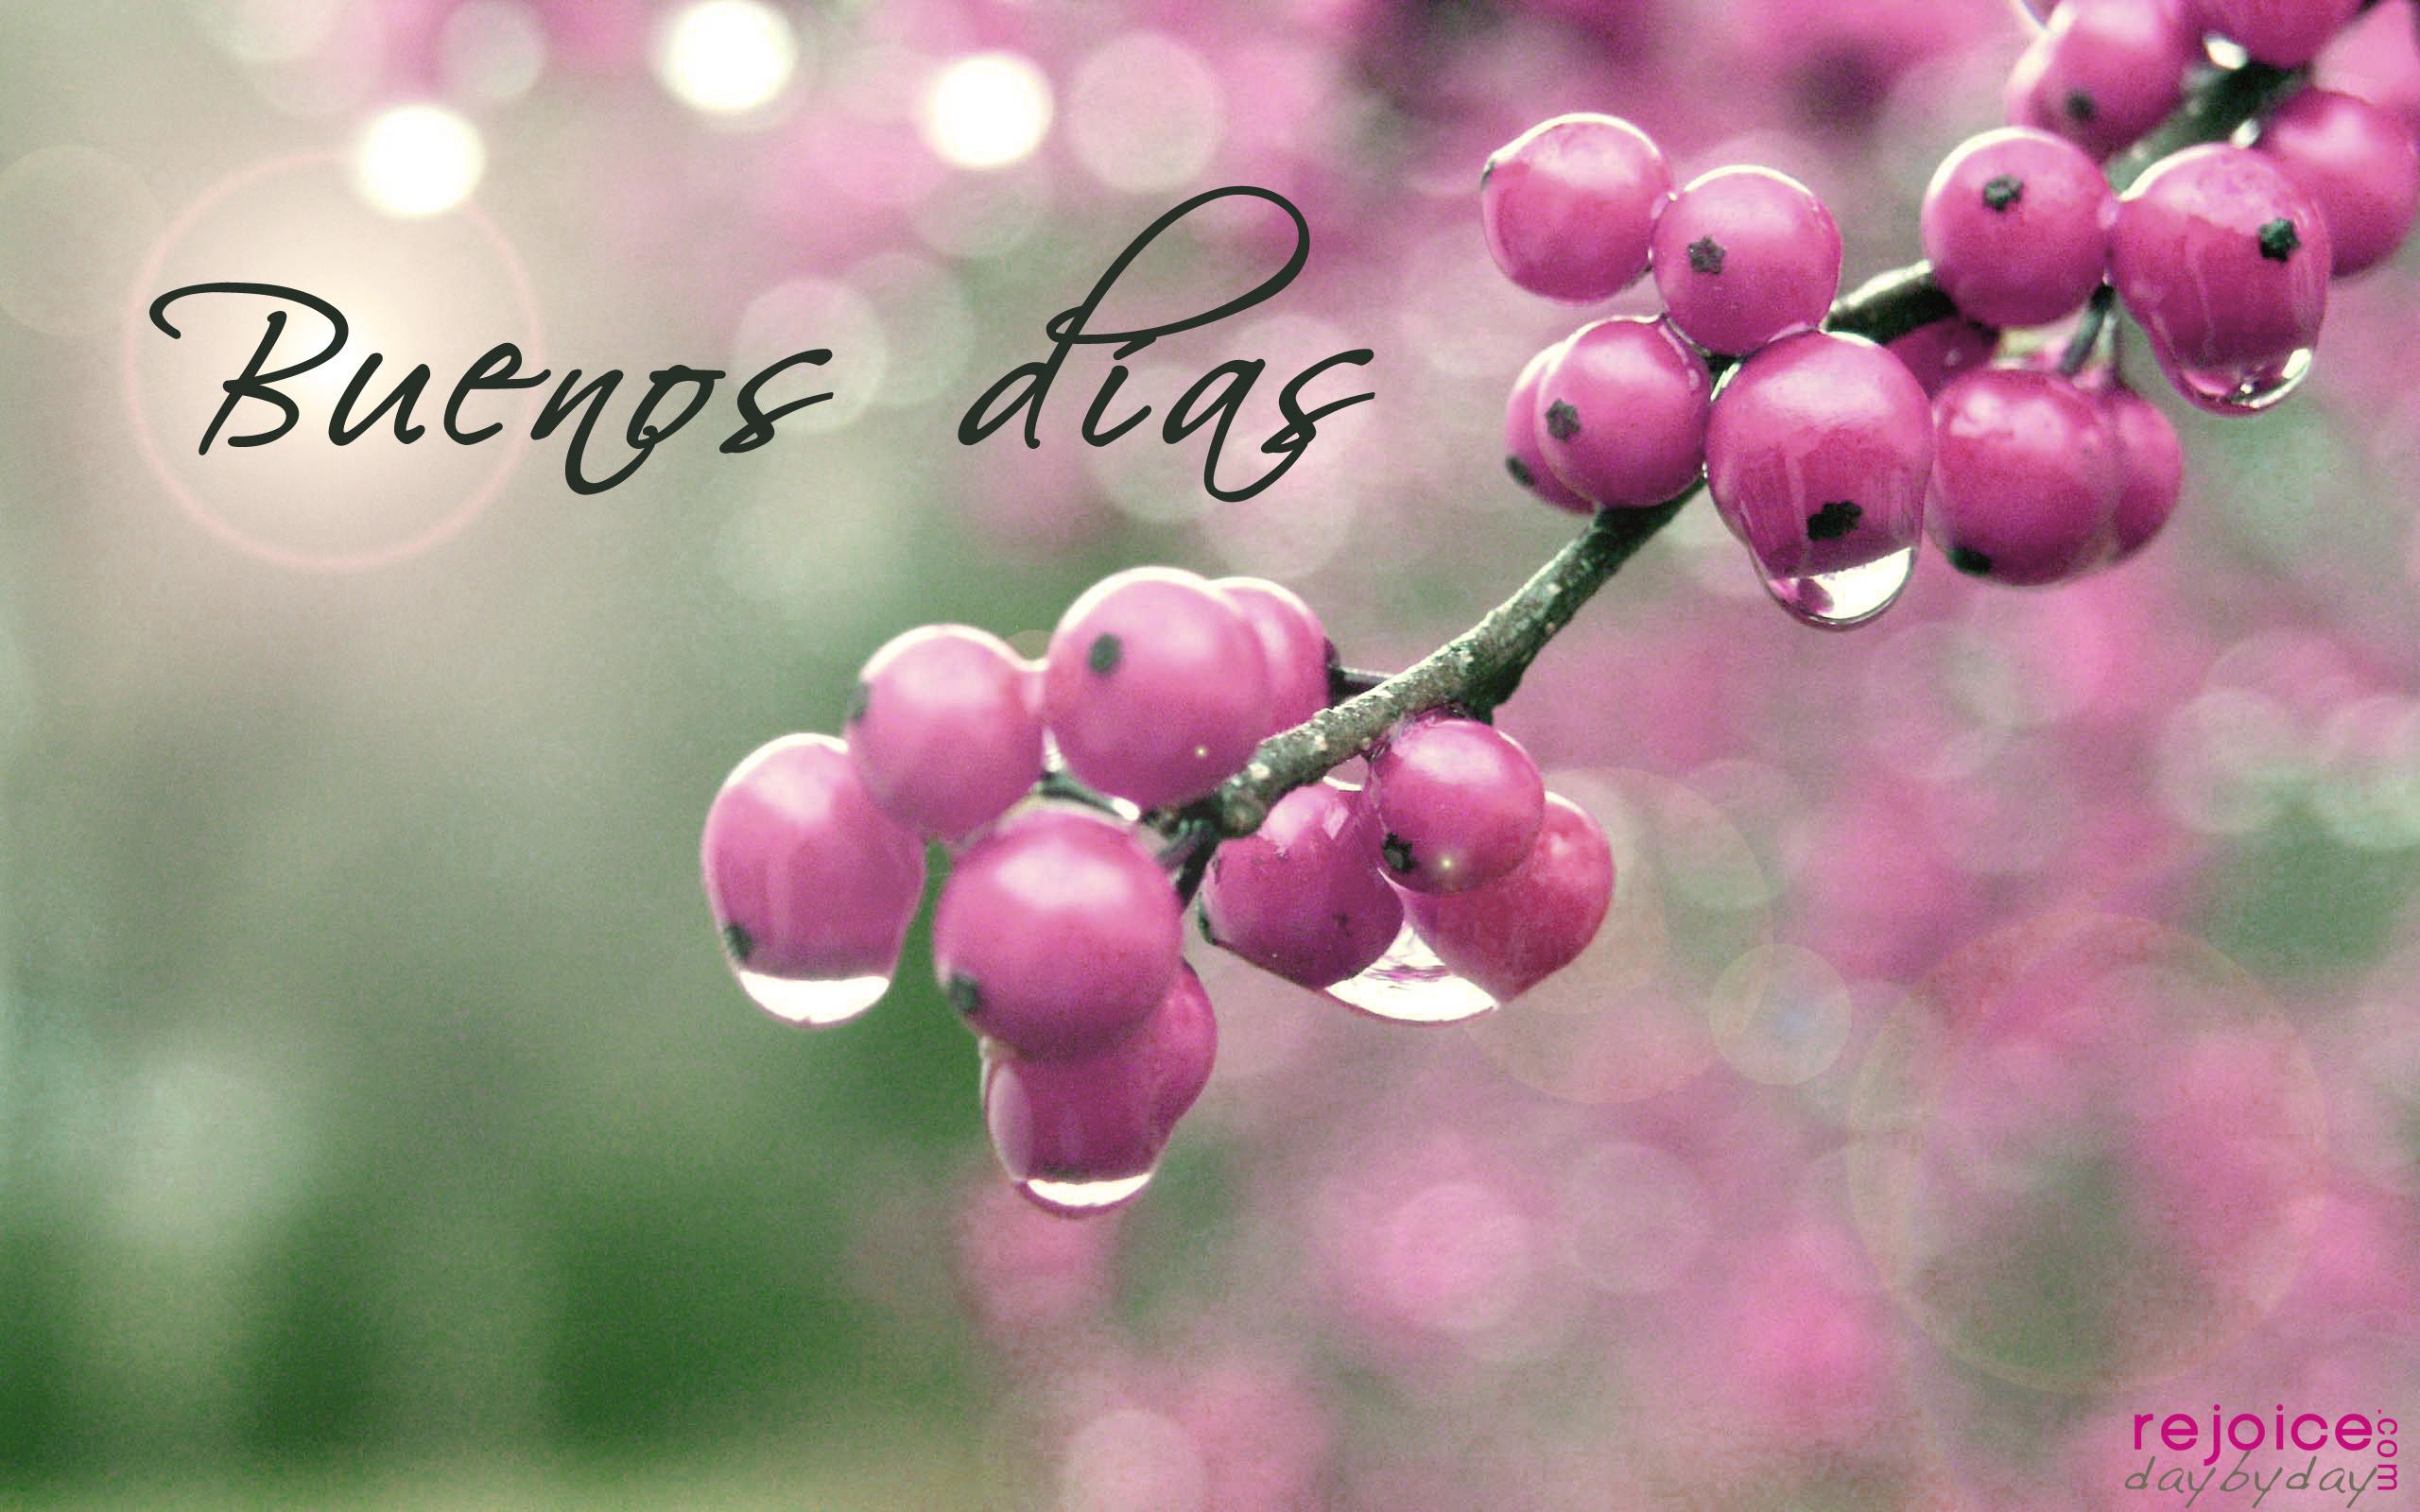 Buenos dias berries